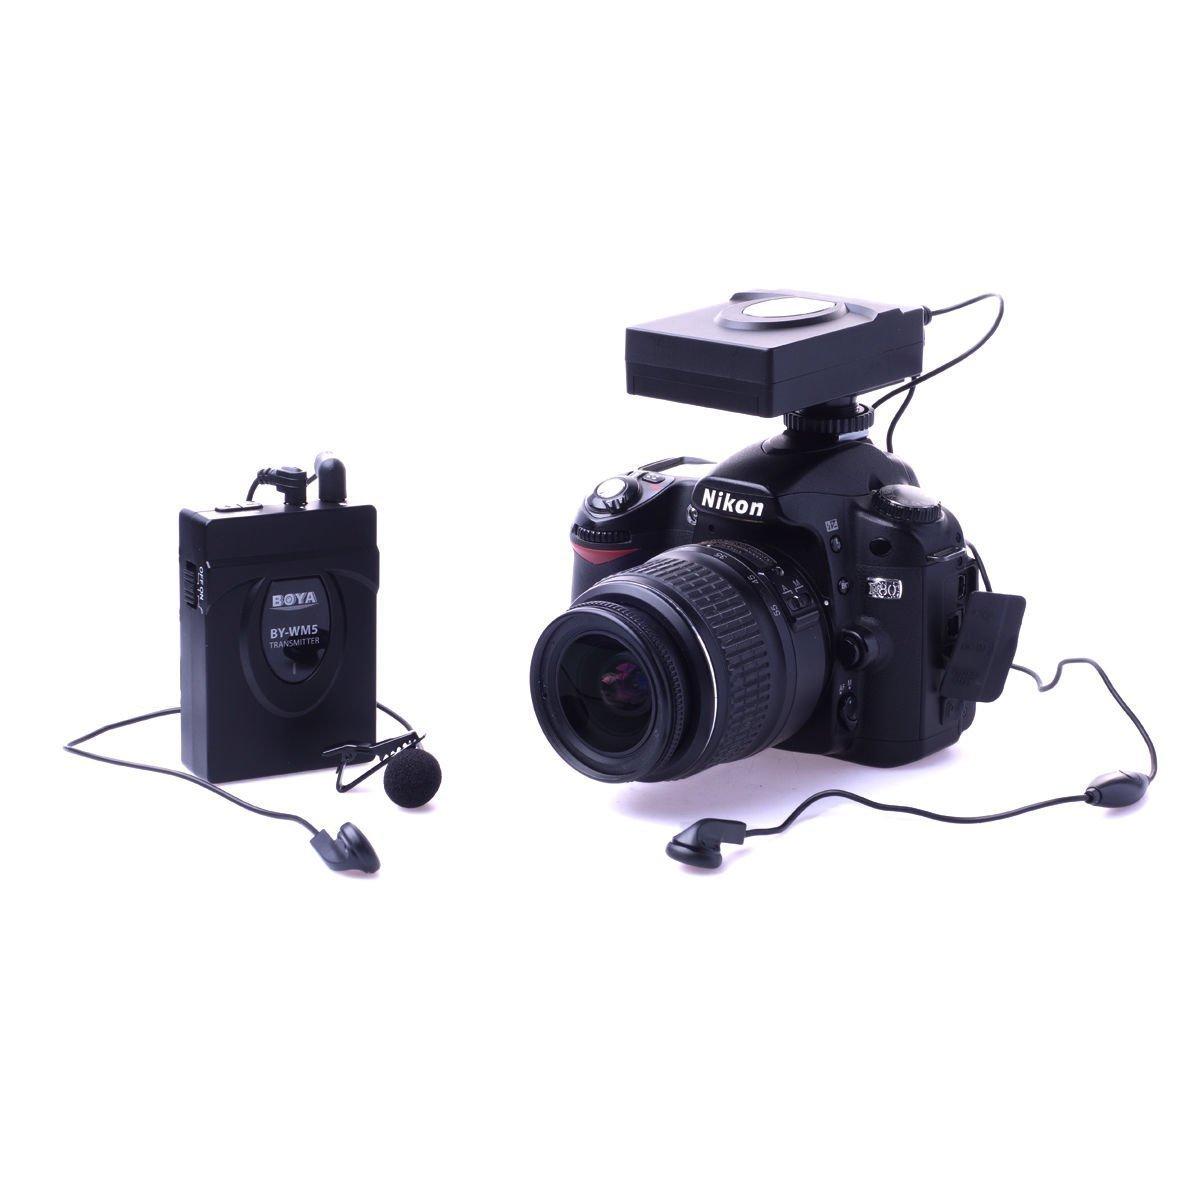 Wireless Lavalier Microphone-BOYA BY-WM5 2.4GHz System LapelMic for Canon Nikon Sony DSLR Camera Camcorder Audio Recorder DV by BOYA